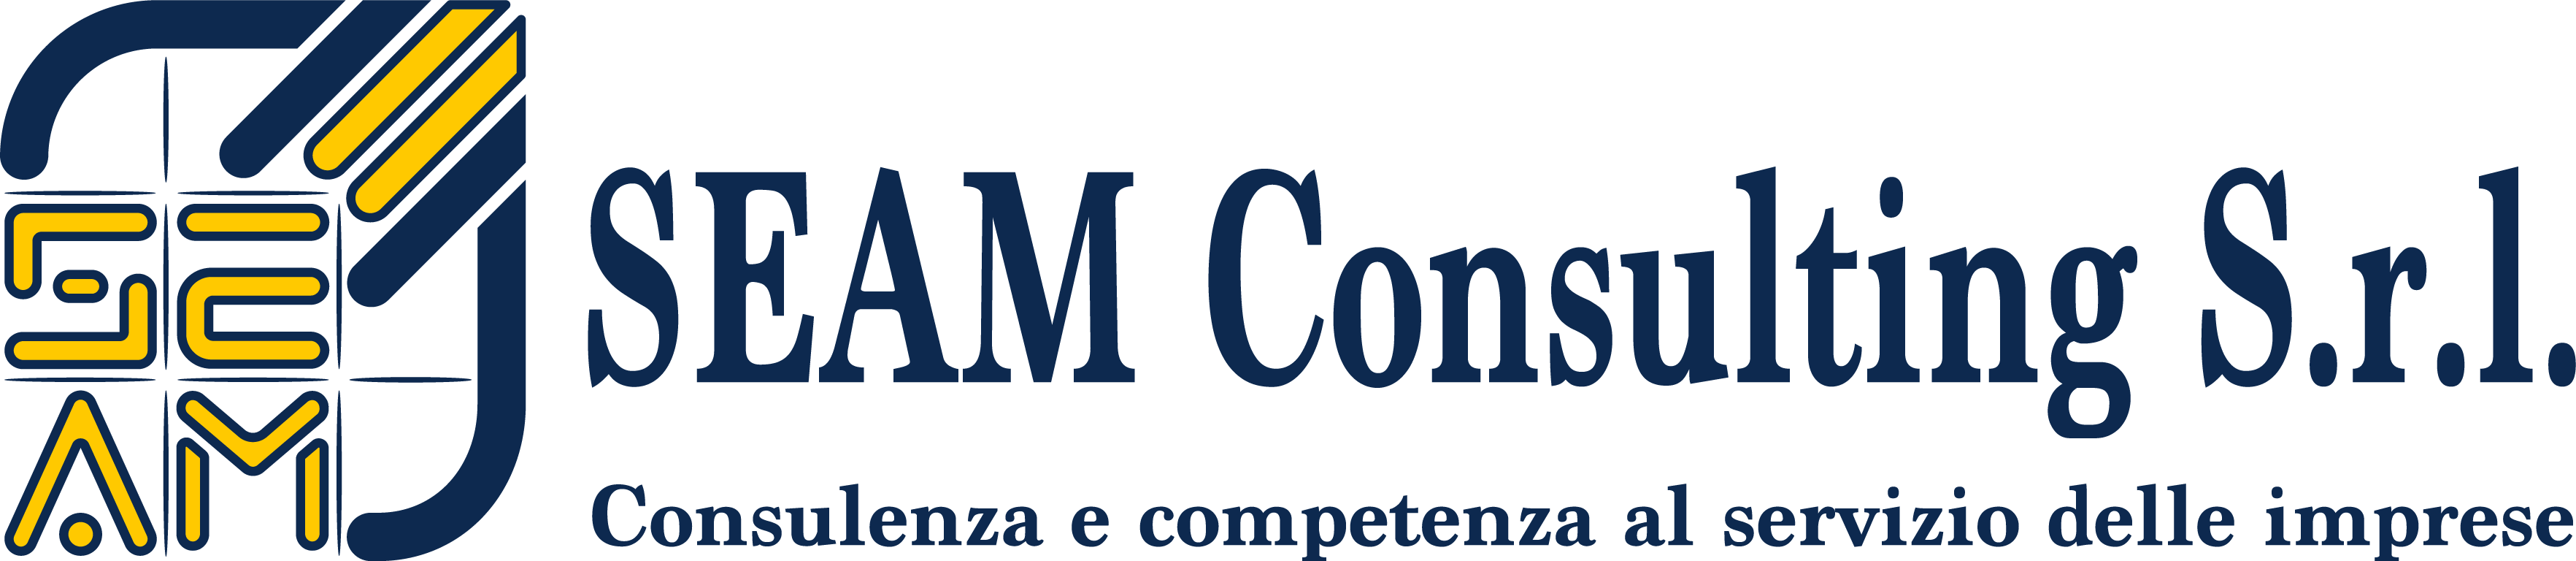 SEAM Consulting S.r.l.